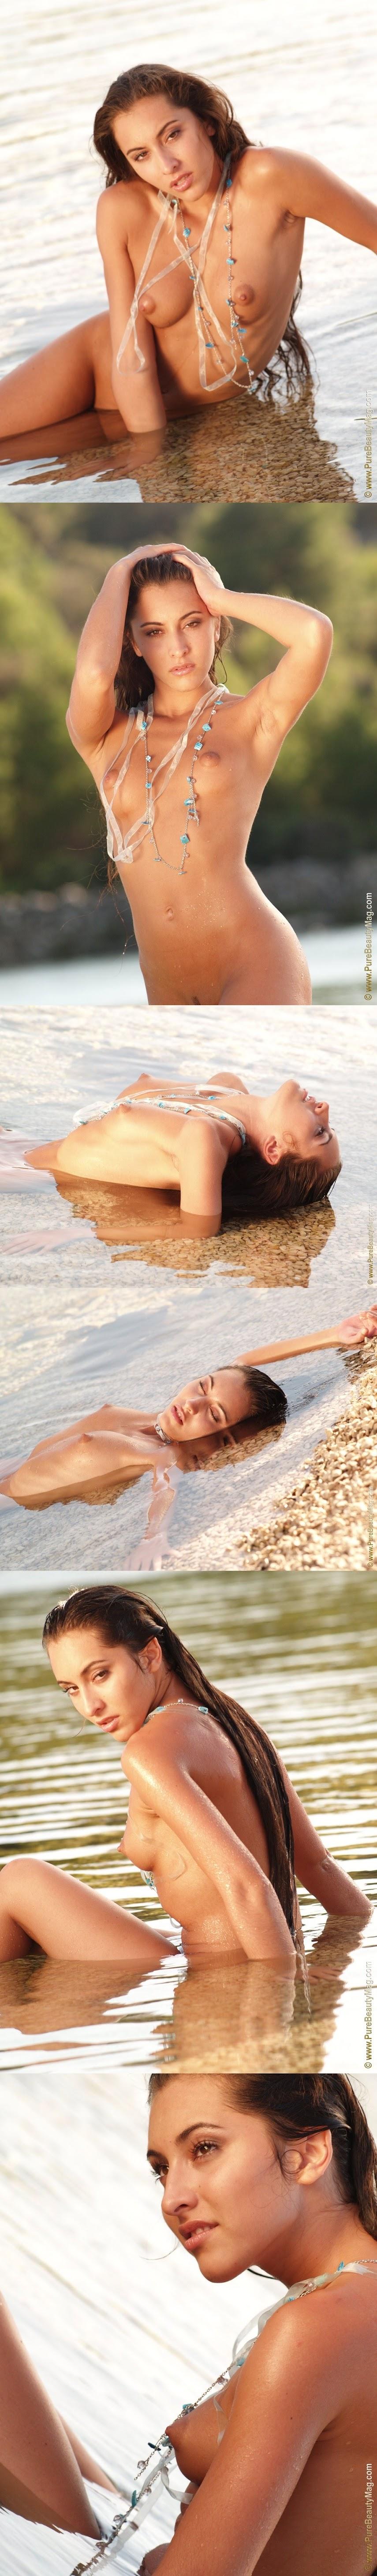 PureBeautyMag PBM  - 2006-03-28 - #s199468 - Zuzana M - Madonna - 3872px